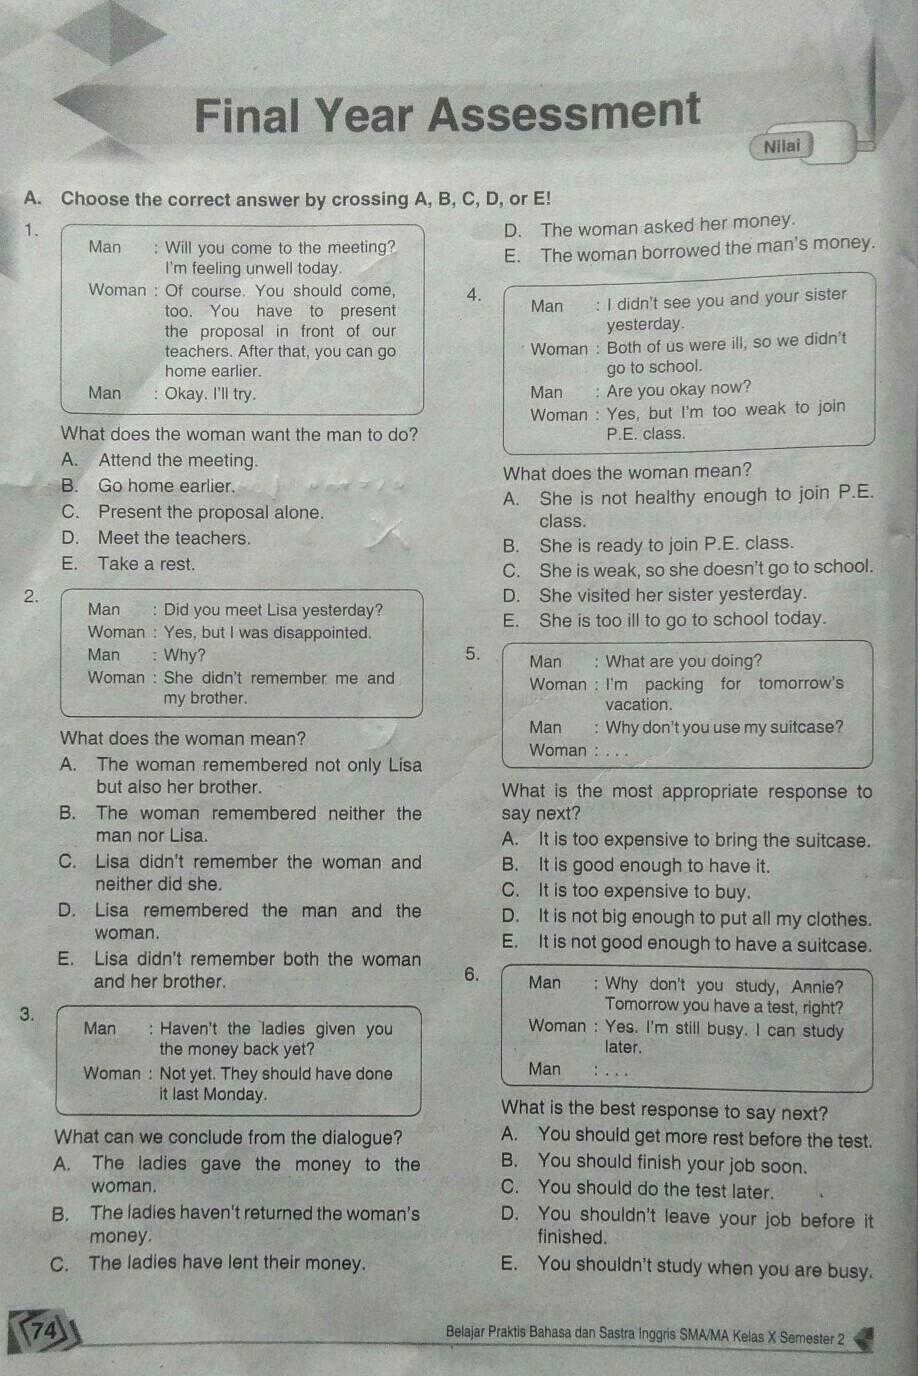 Mintak Kunci Jawaban Final Year Assessment Kelas 10 Semester 2